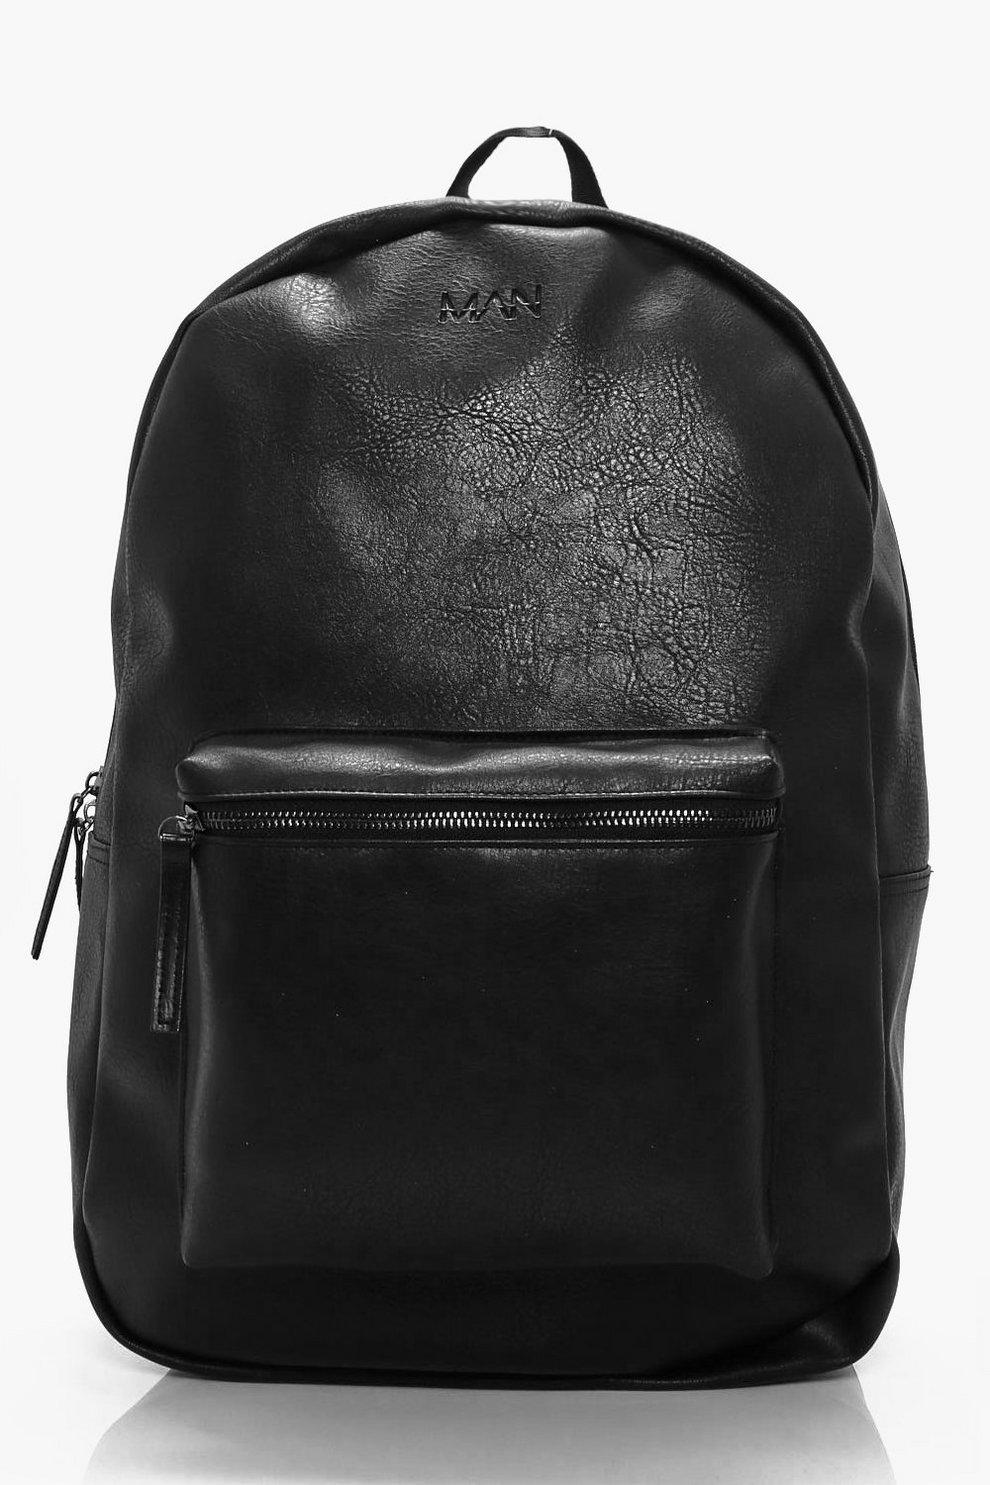 533515fd4 Black Leather Look Backpack | Boohoo